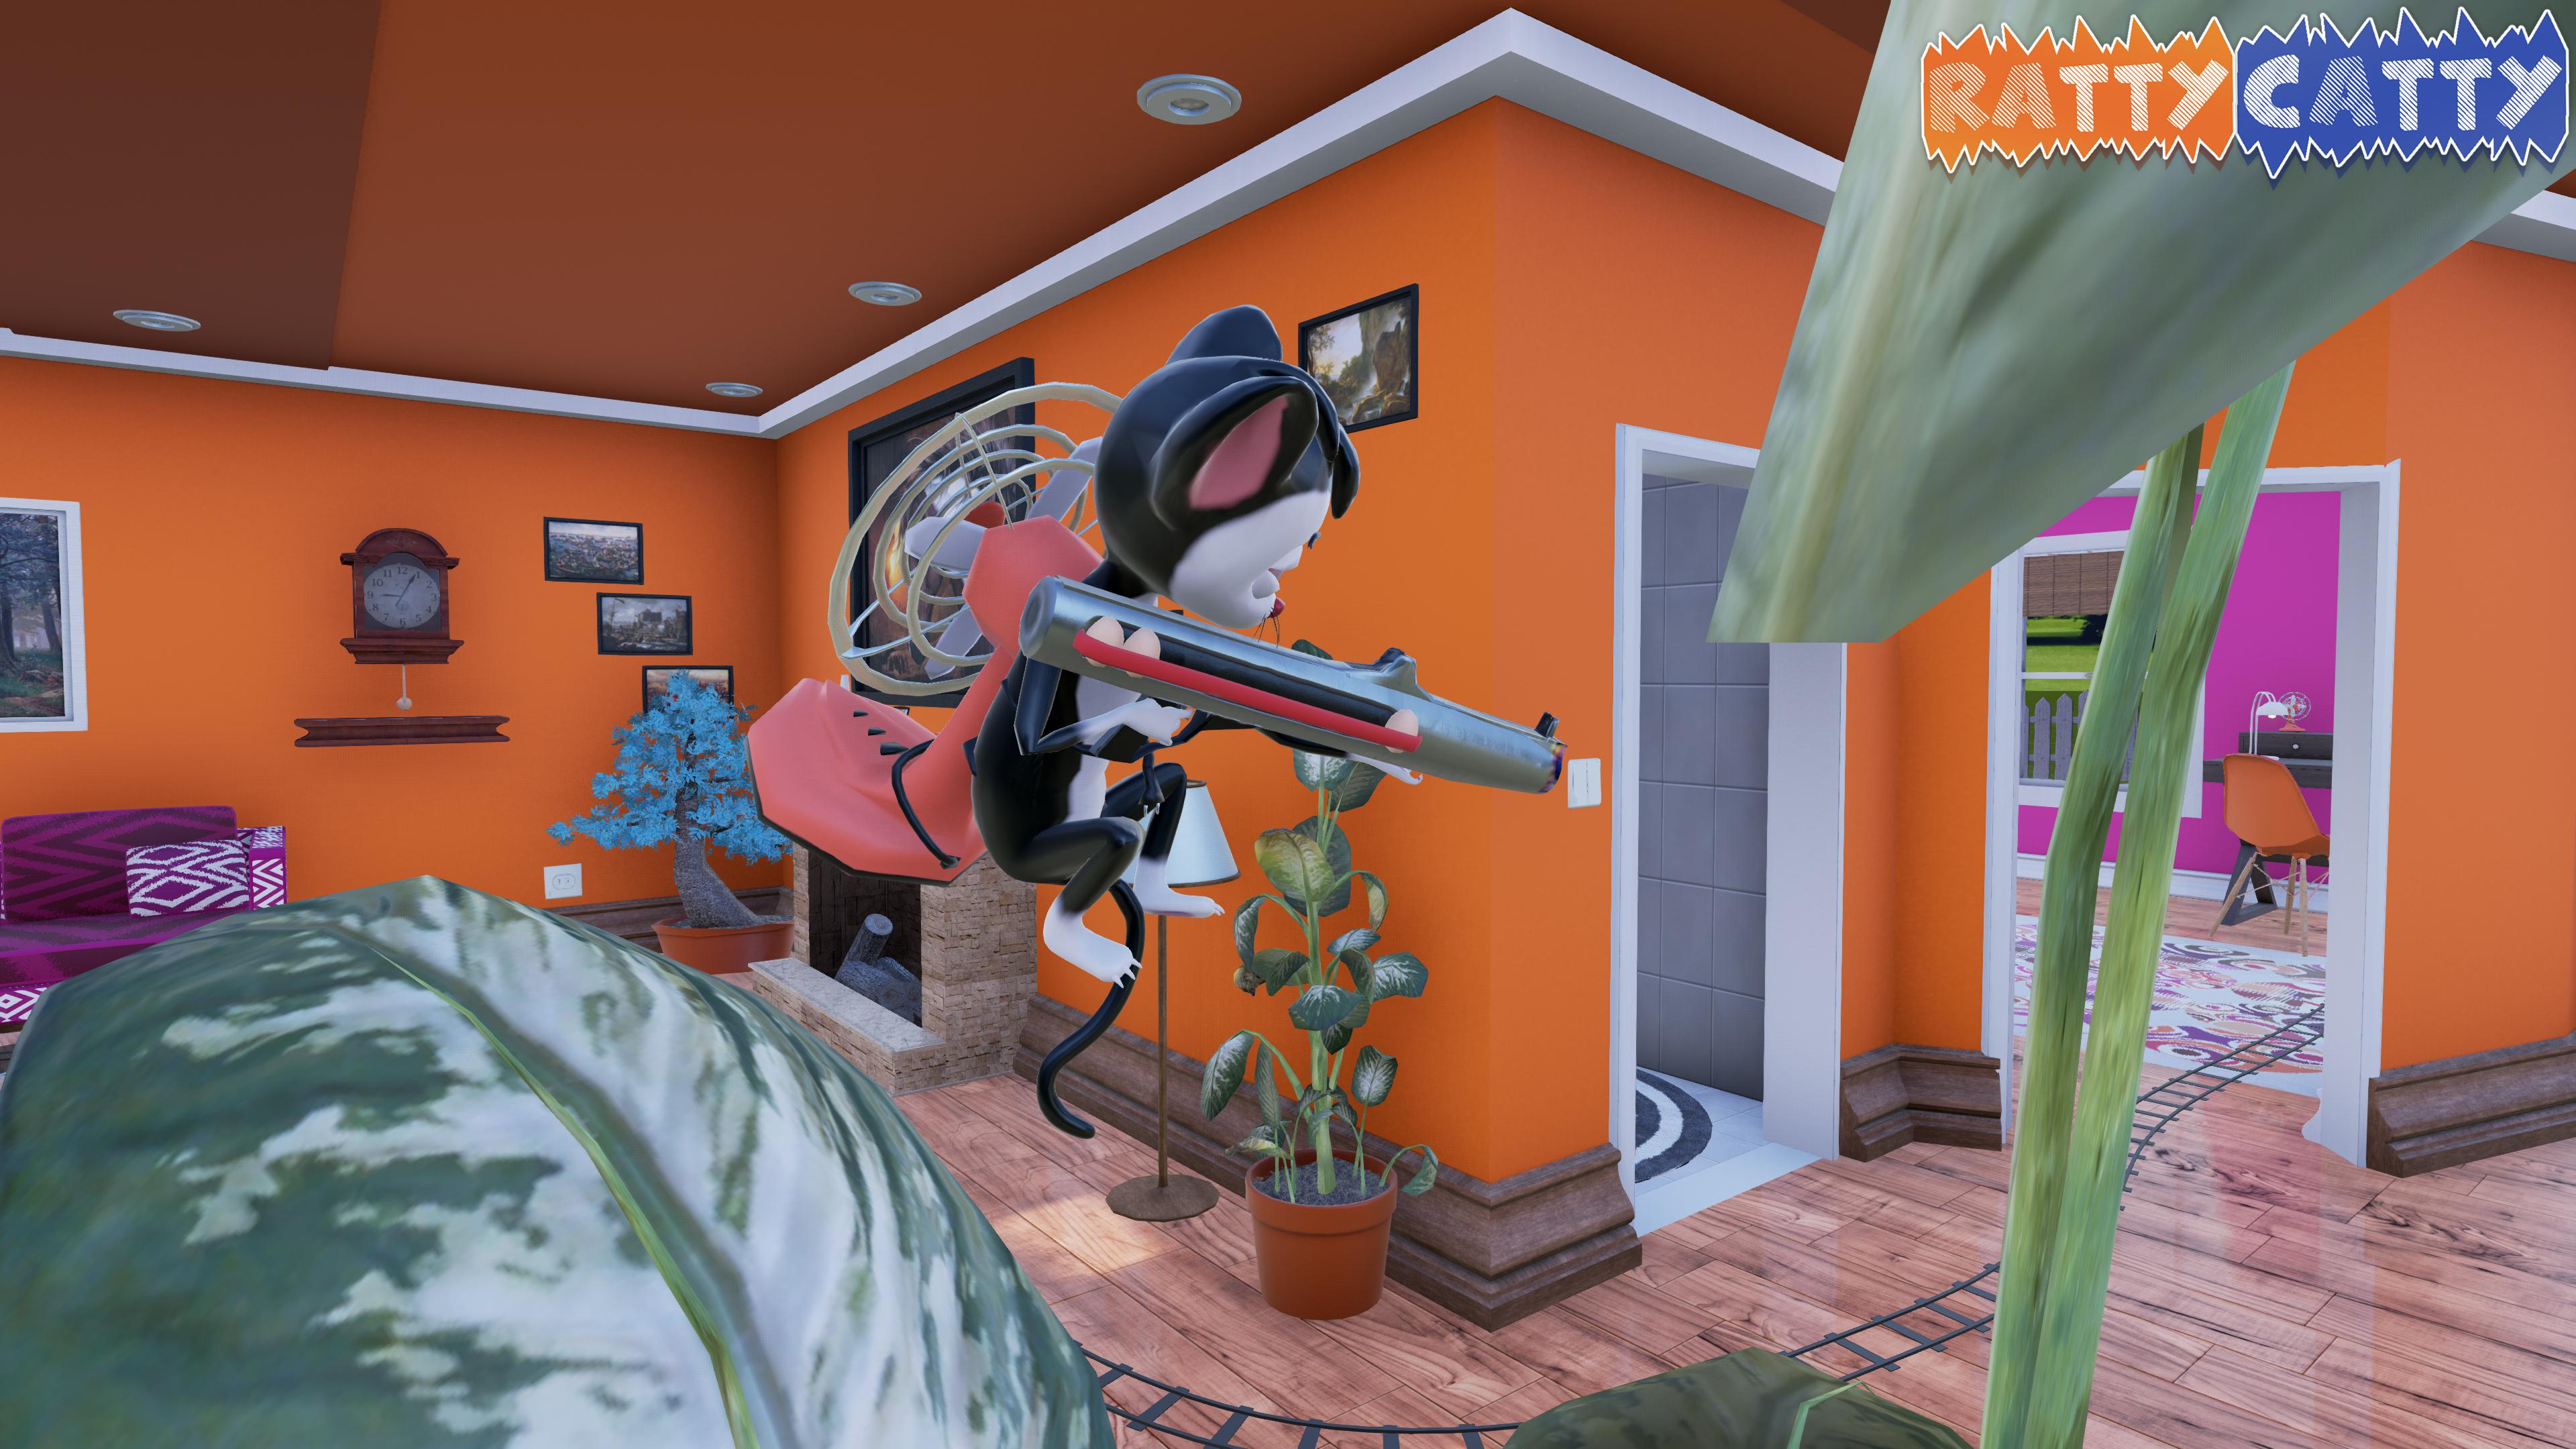 Ratty Catty screenshot